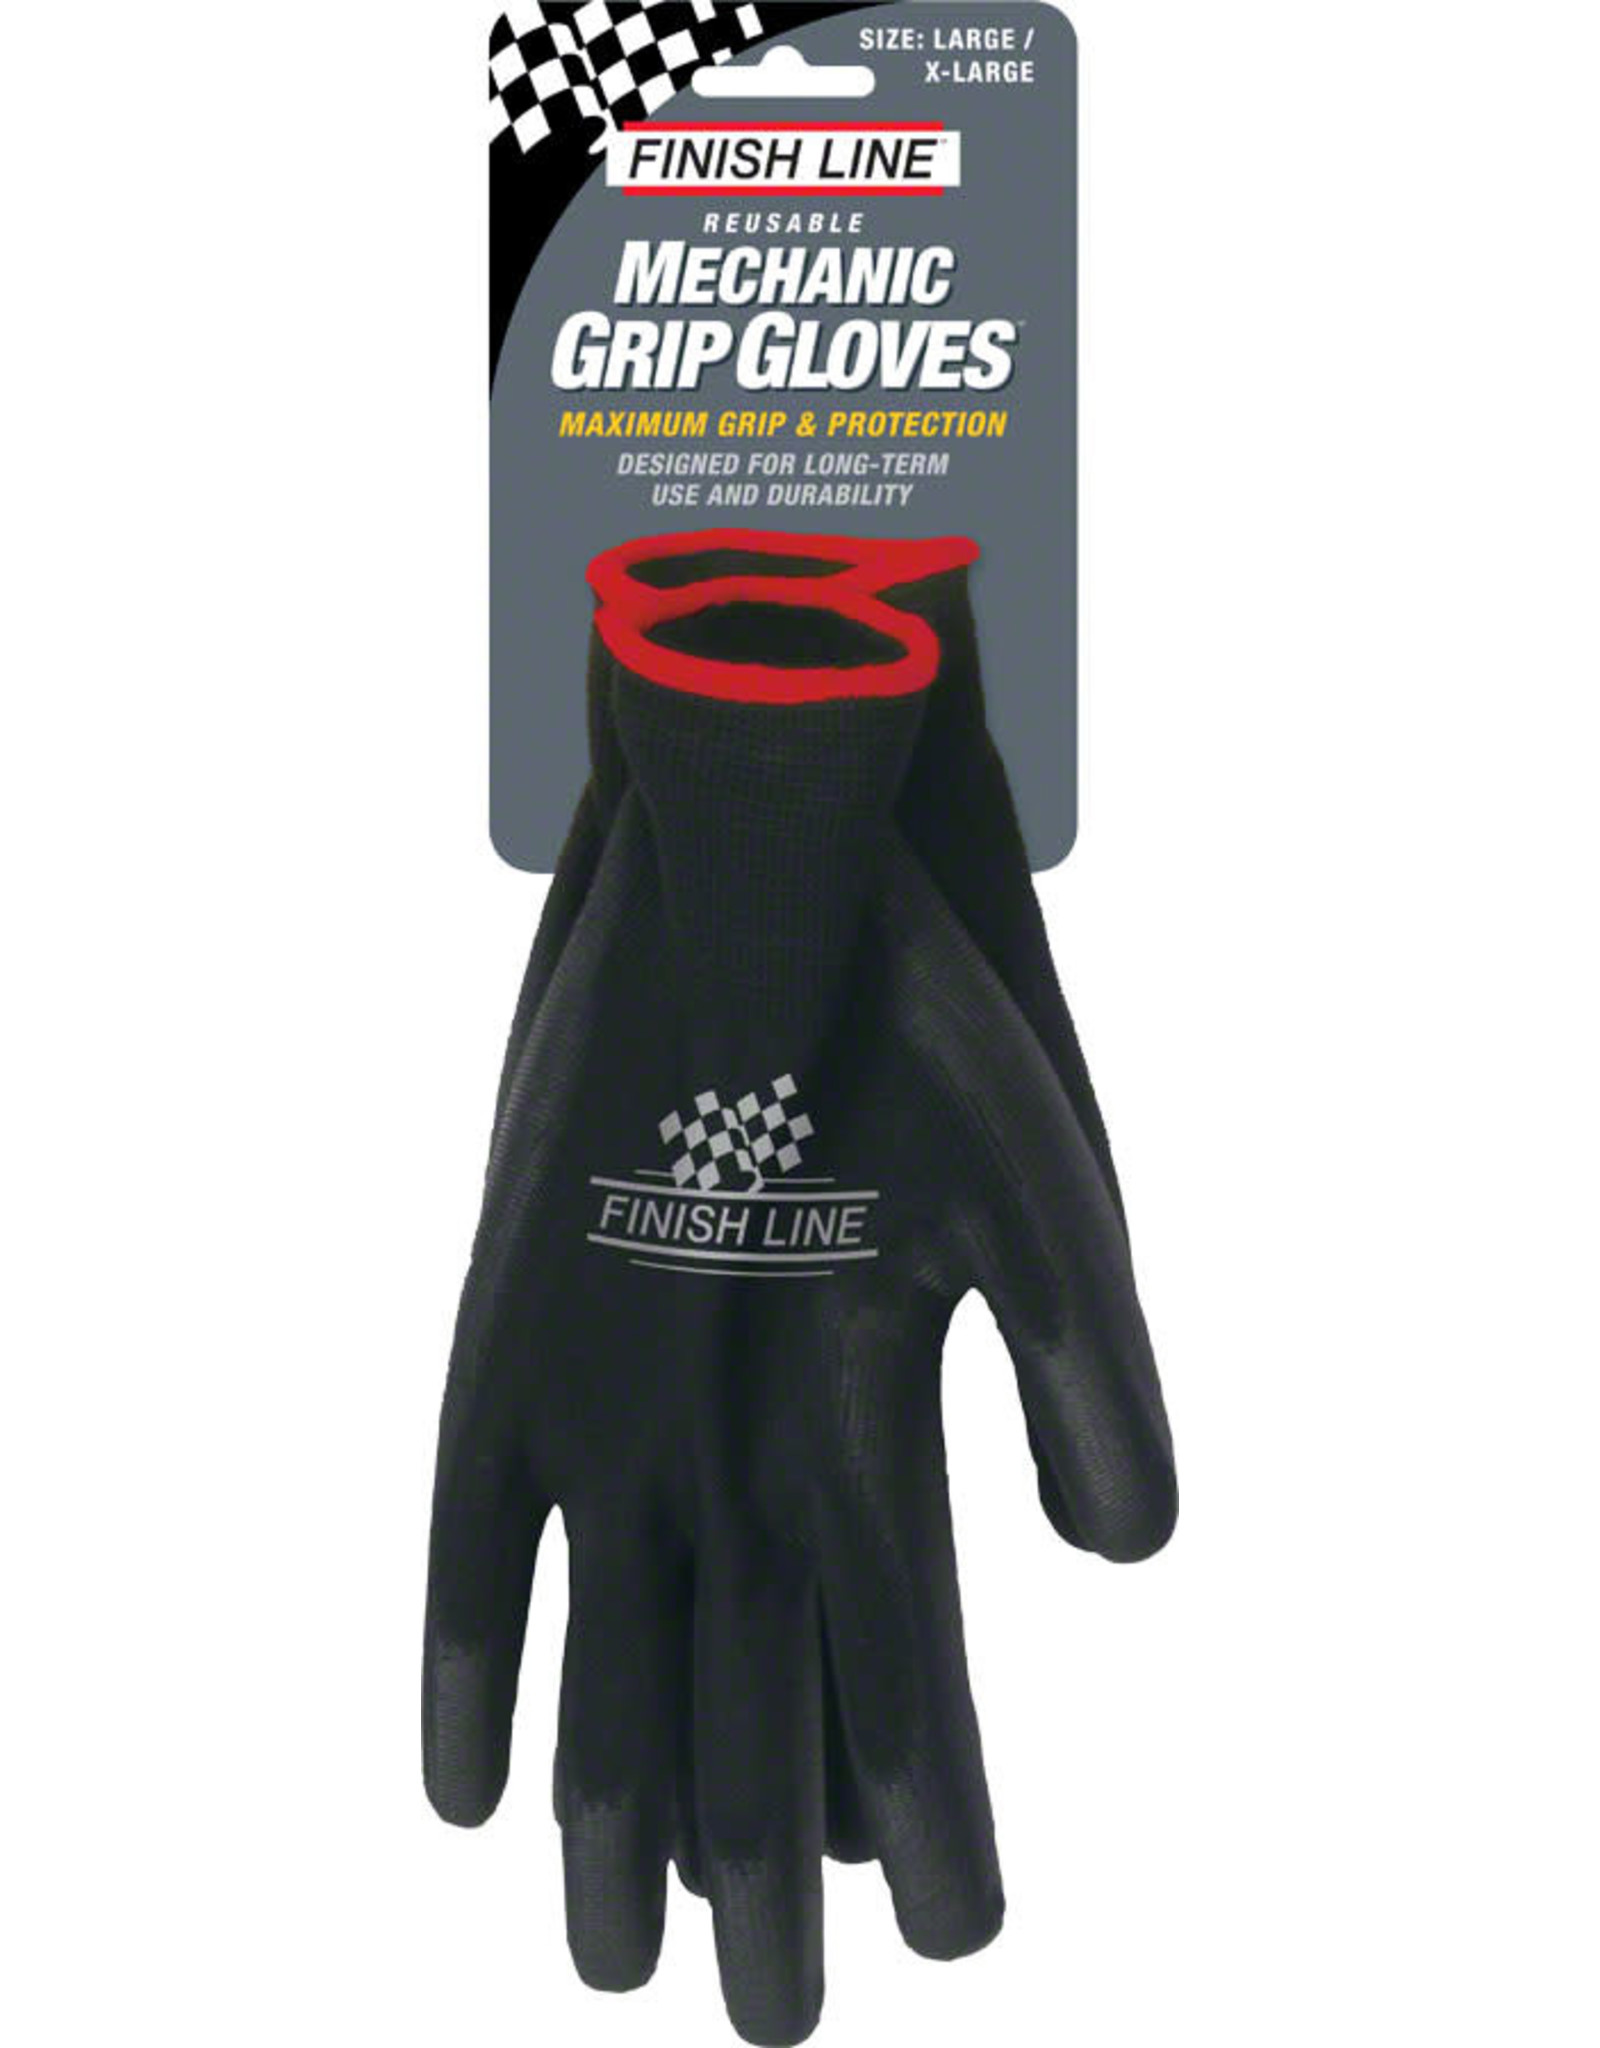 Finish Line Finish Line Mechanic's Grip Gloves, LG/XL